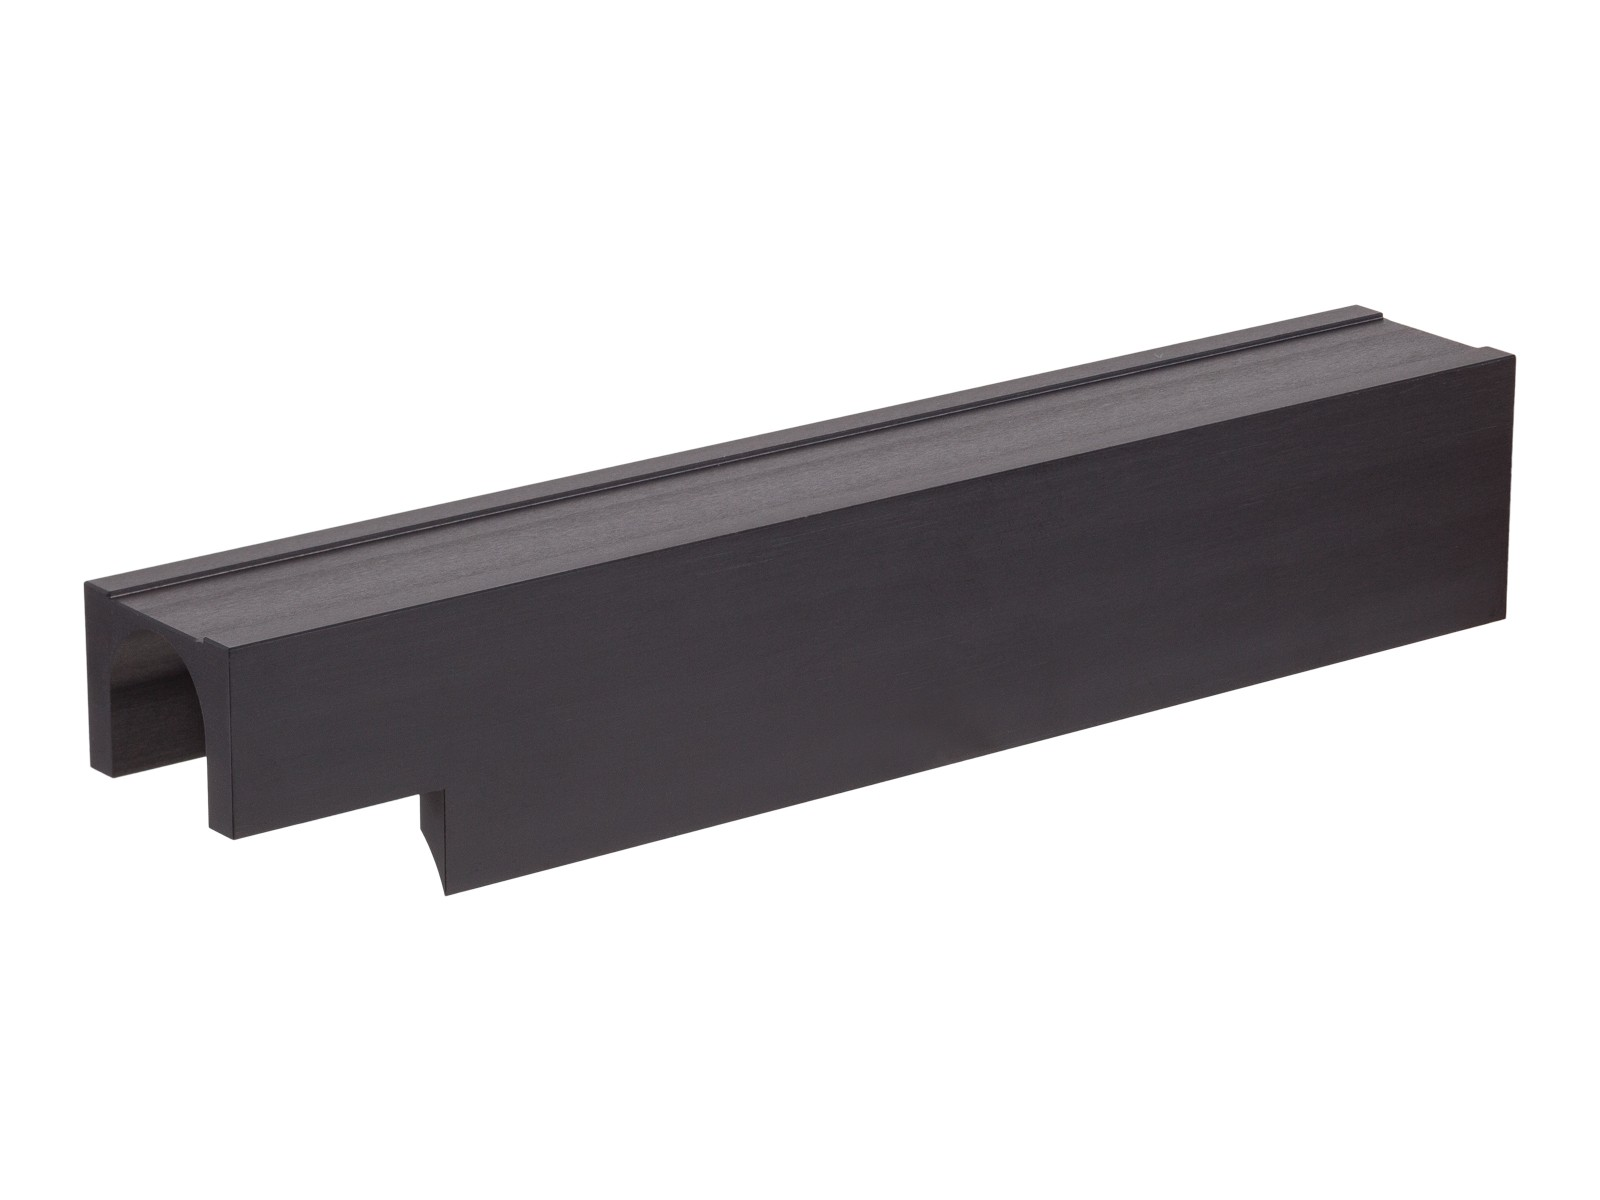 Kraford and Lypt FX Impact MKII Plenum Cover, Black